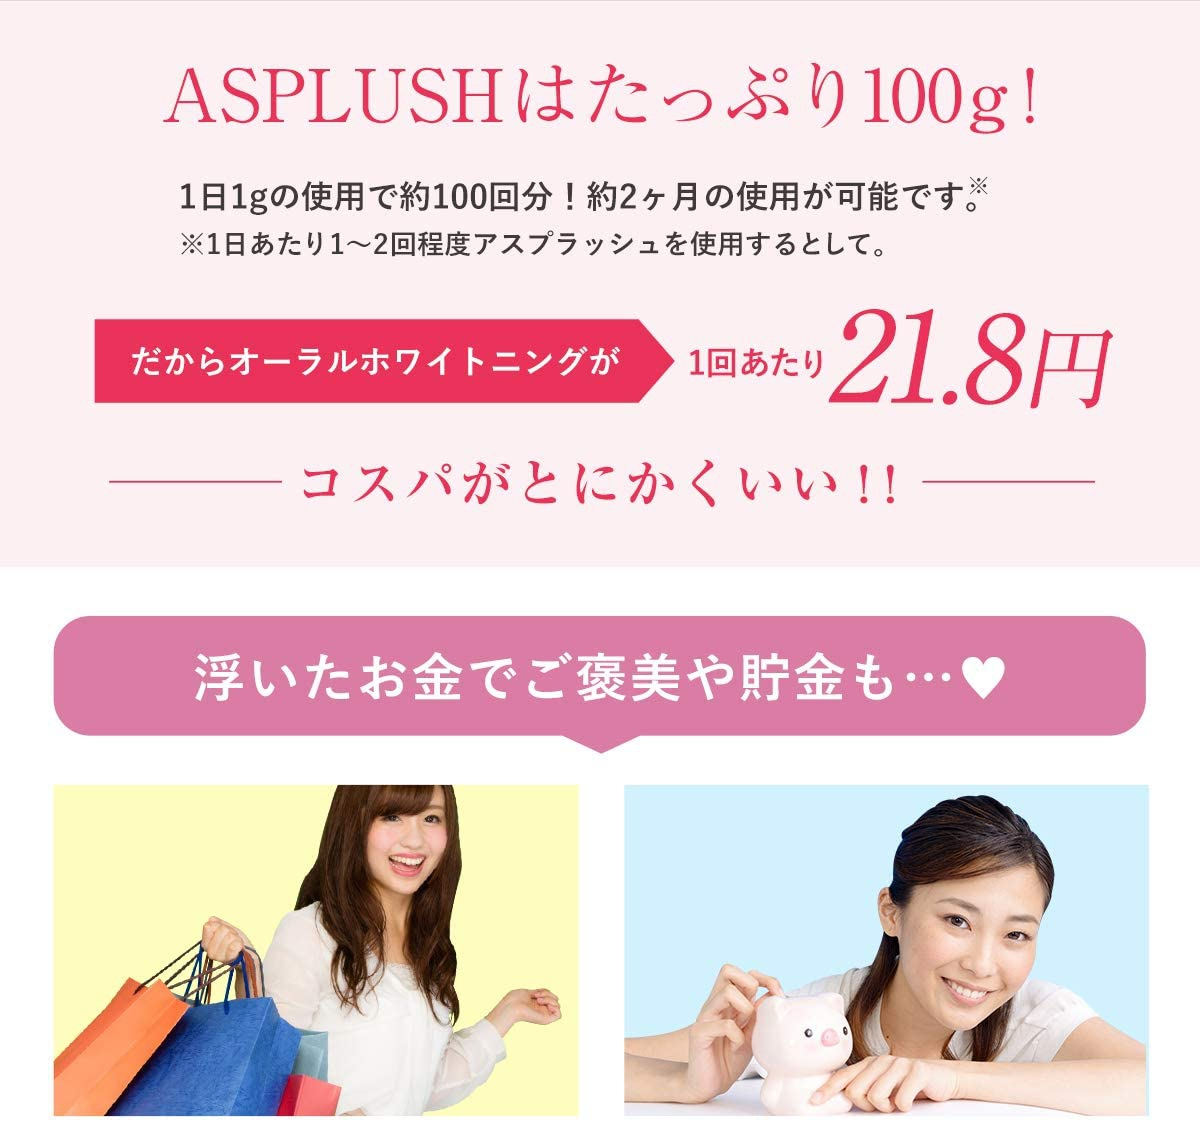 ASPLUSH(アスプラッシュ)ホワイトニング 歯磨き粉の商品画像10